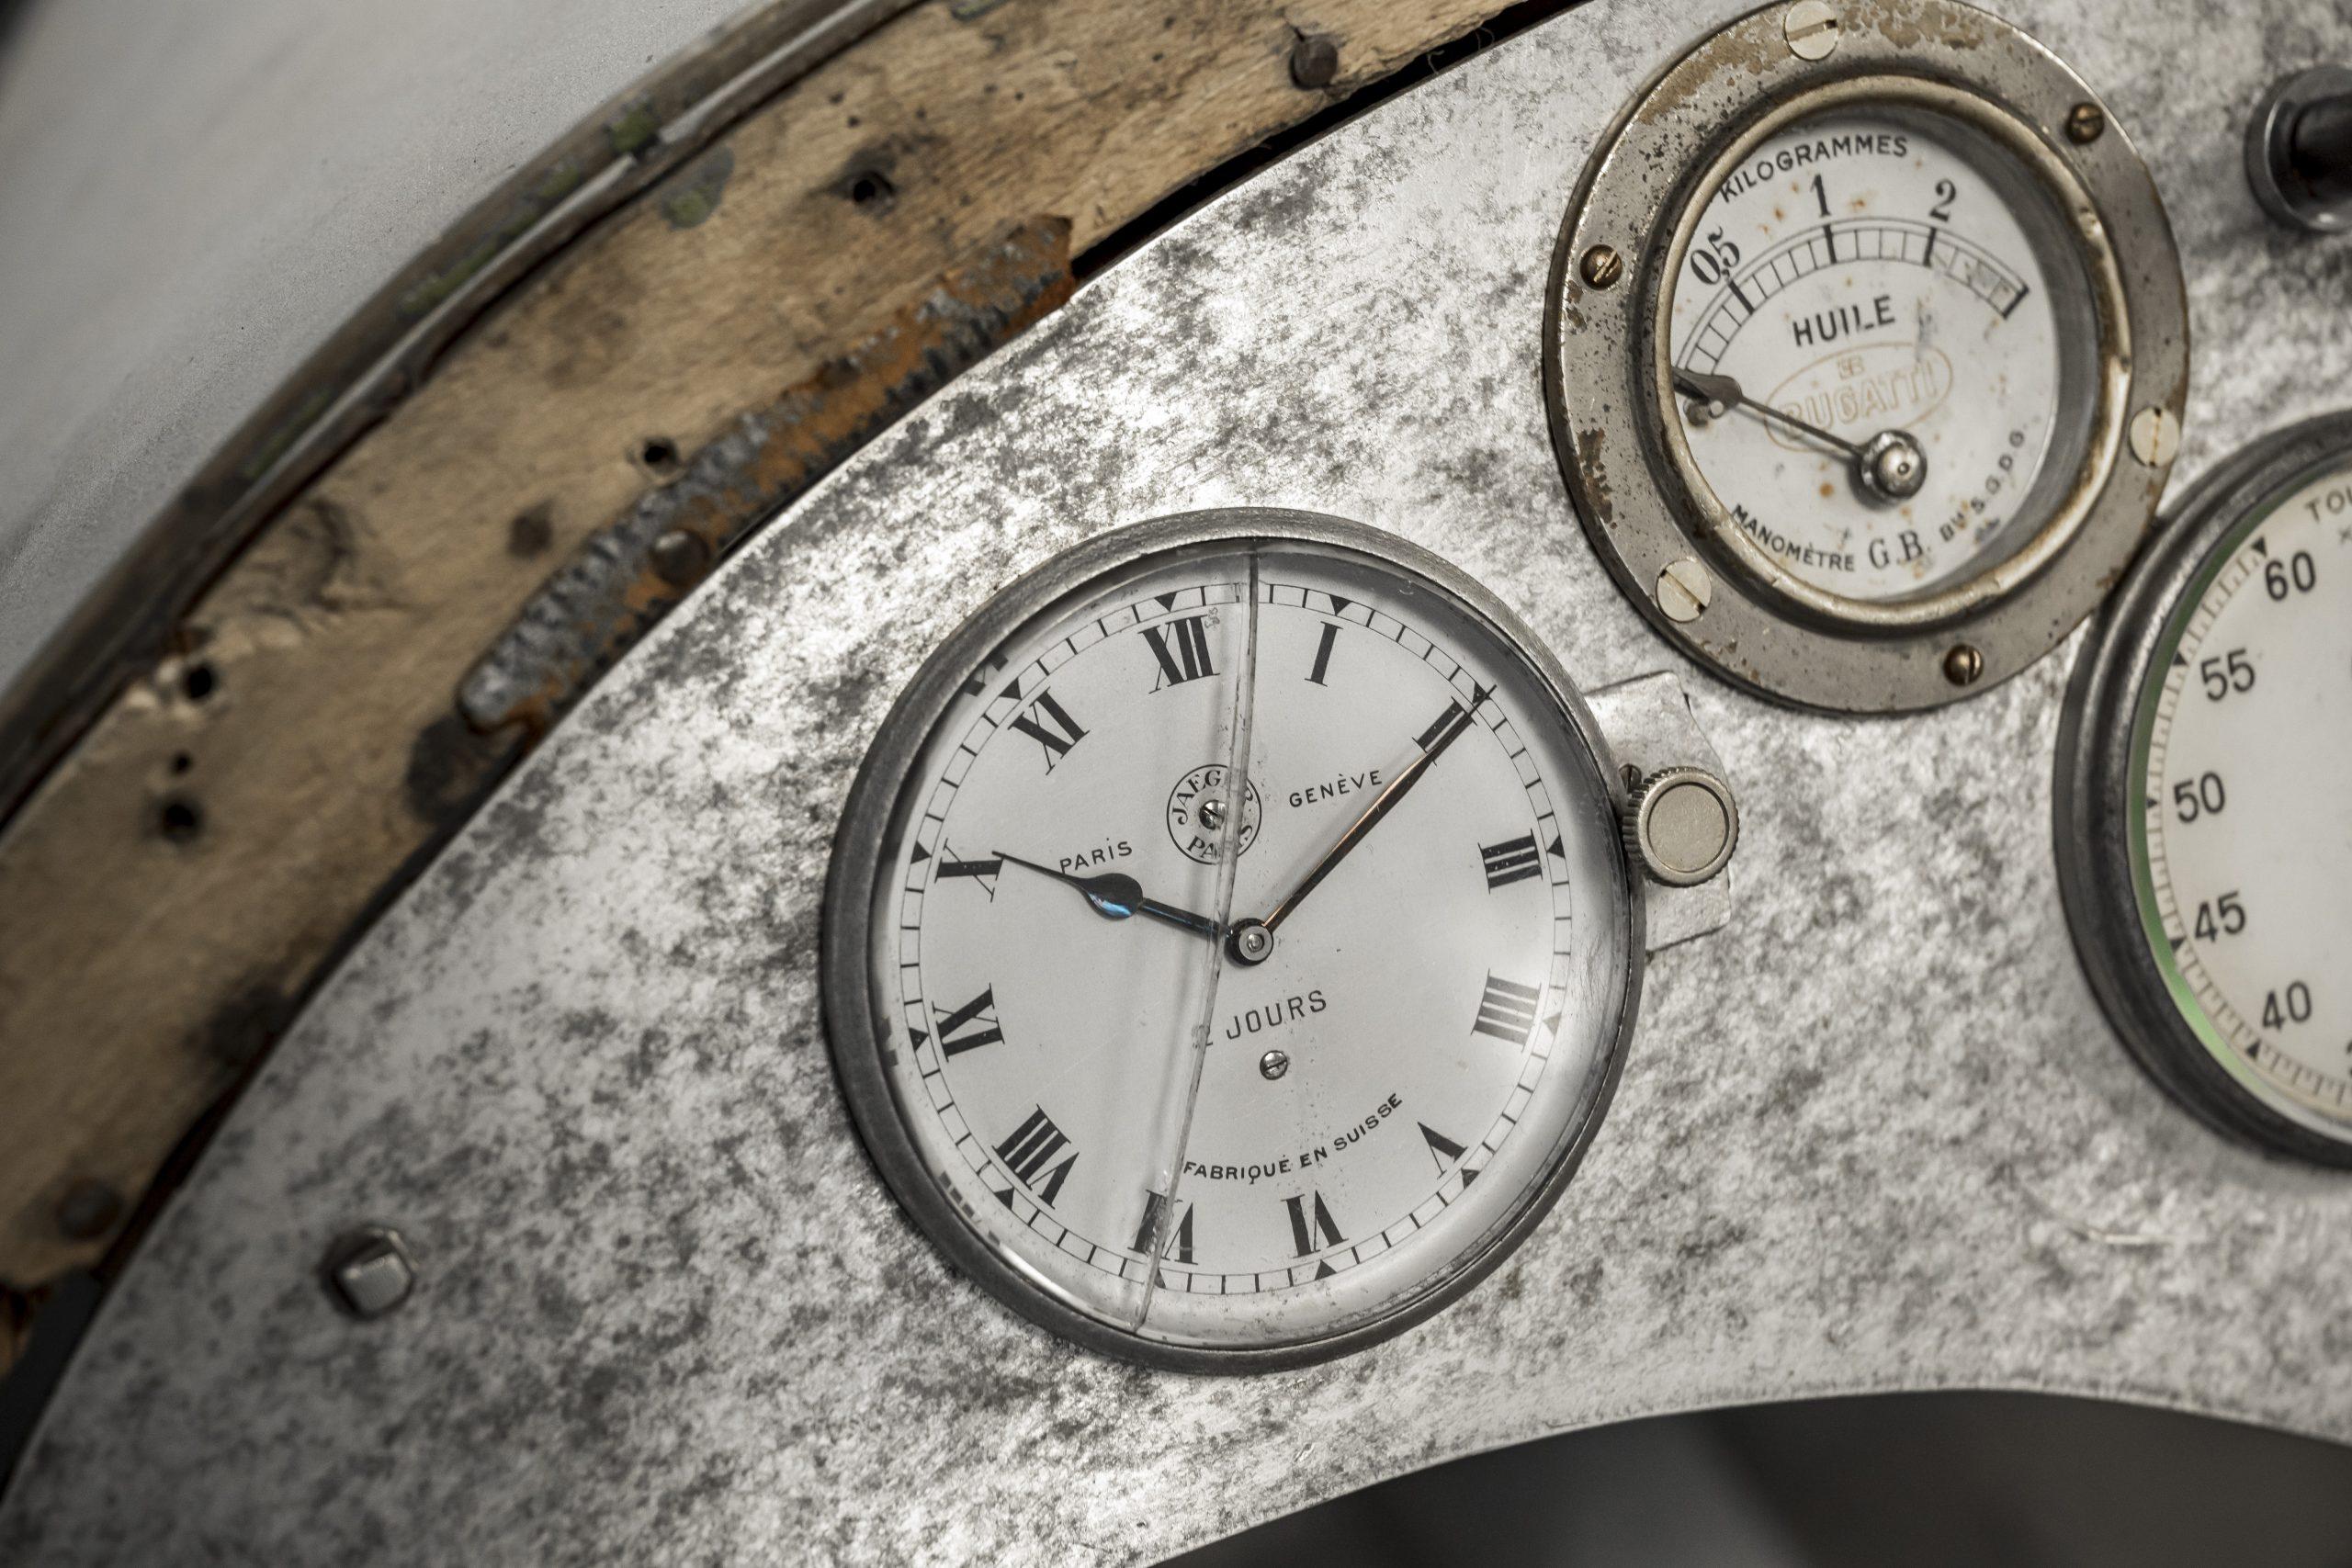 Tula Precision clock gauge detail